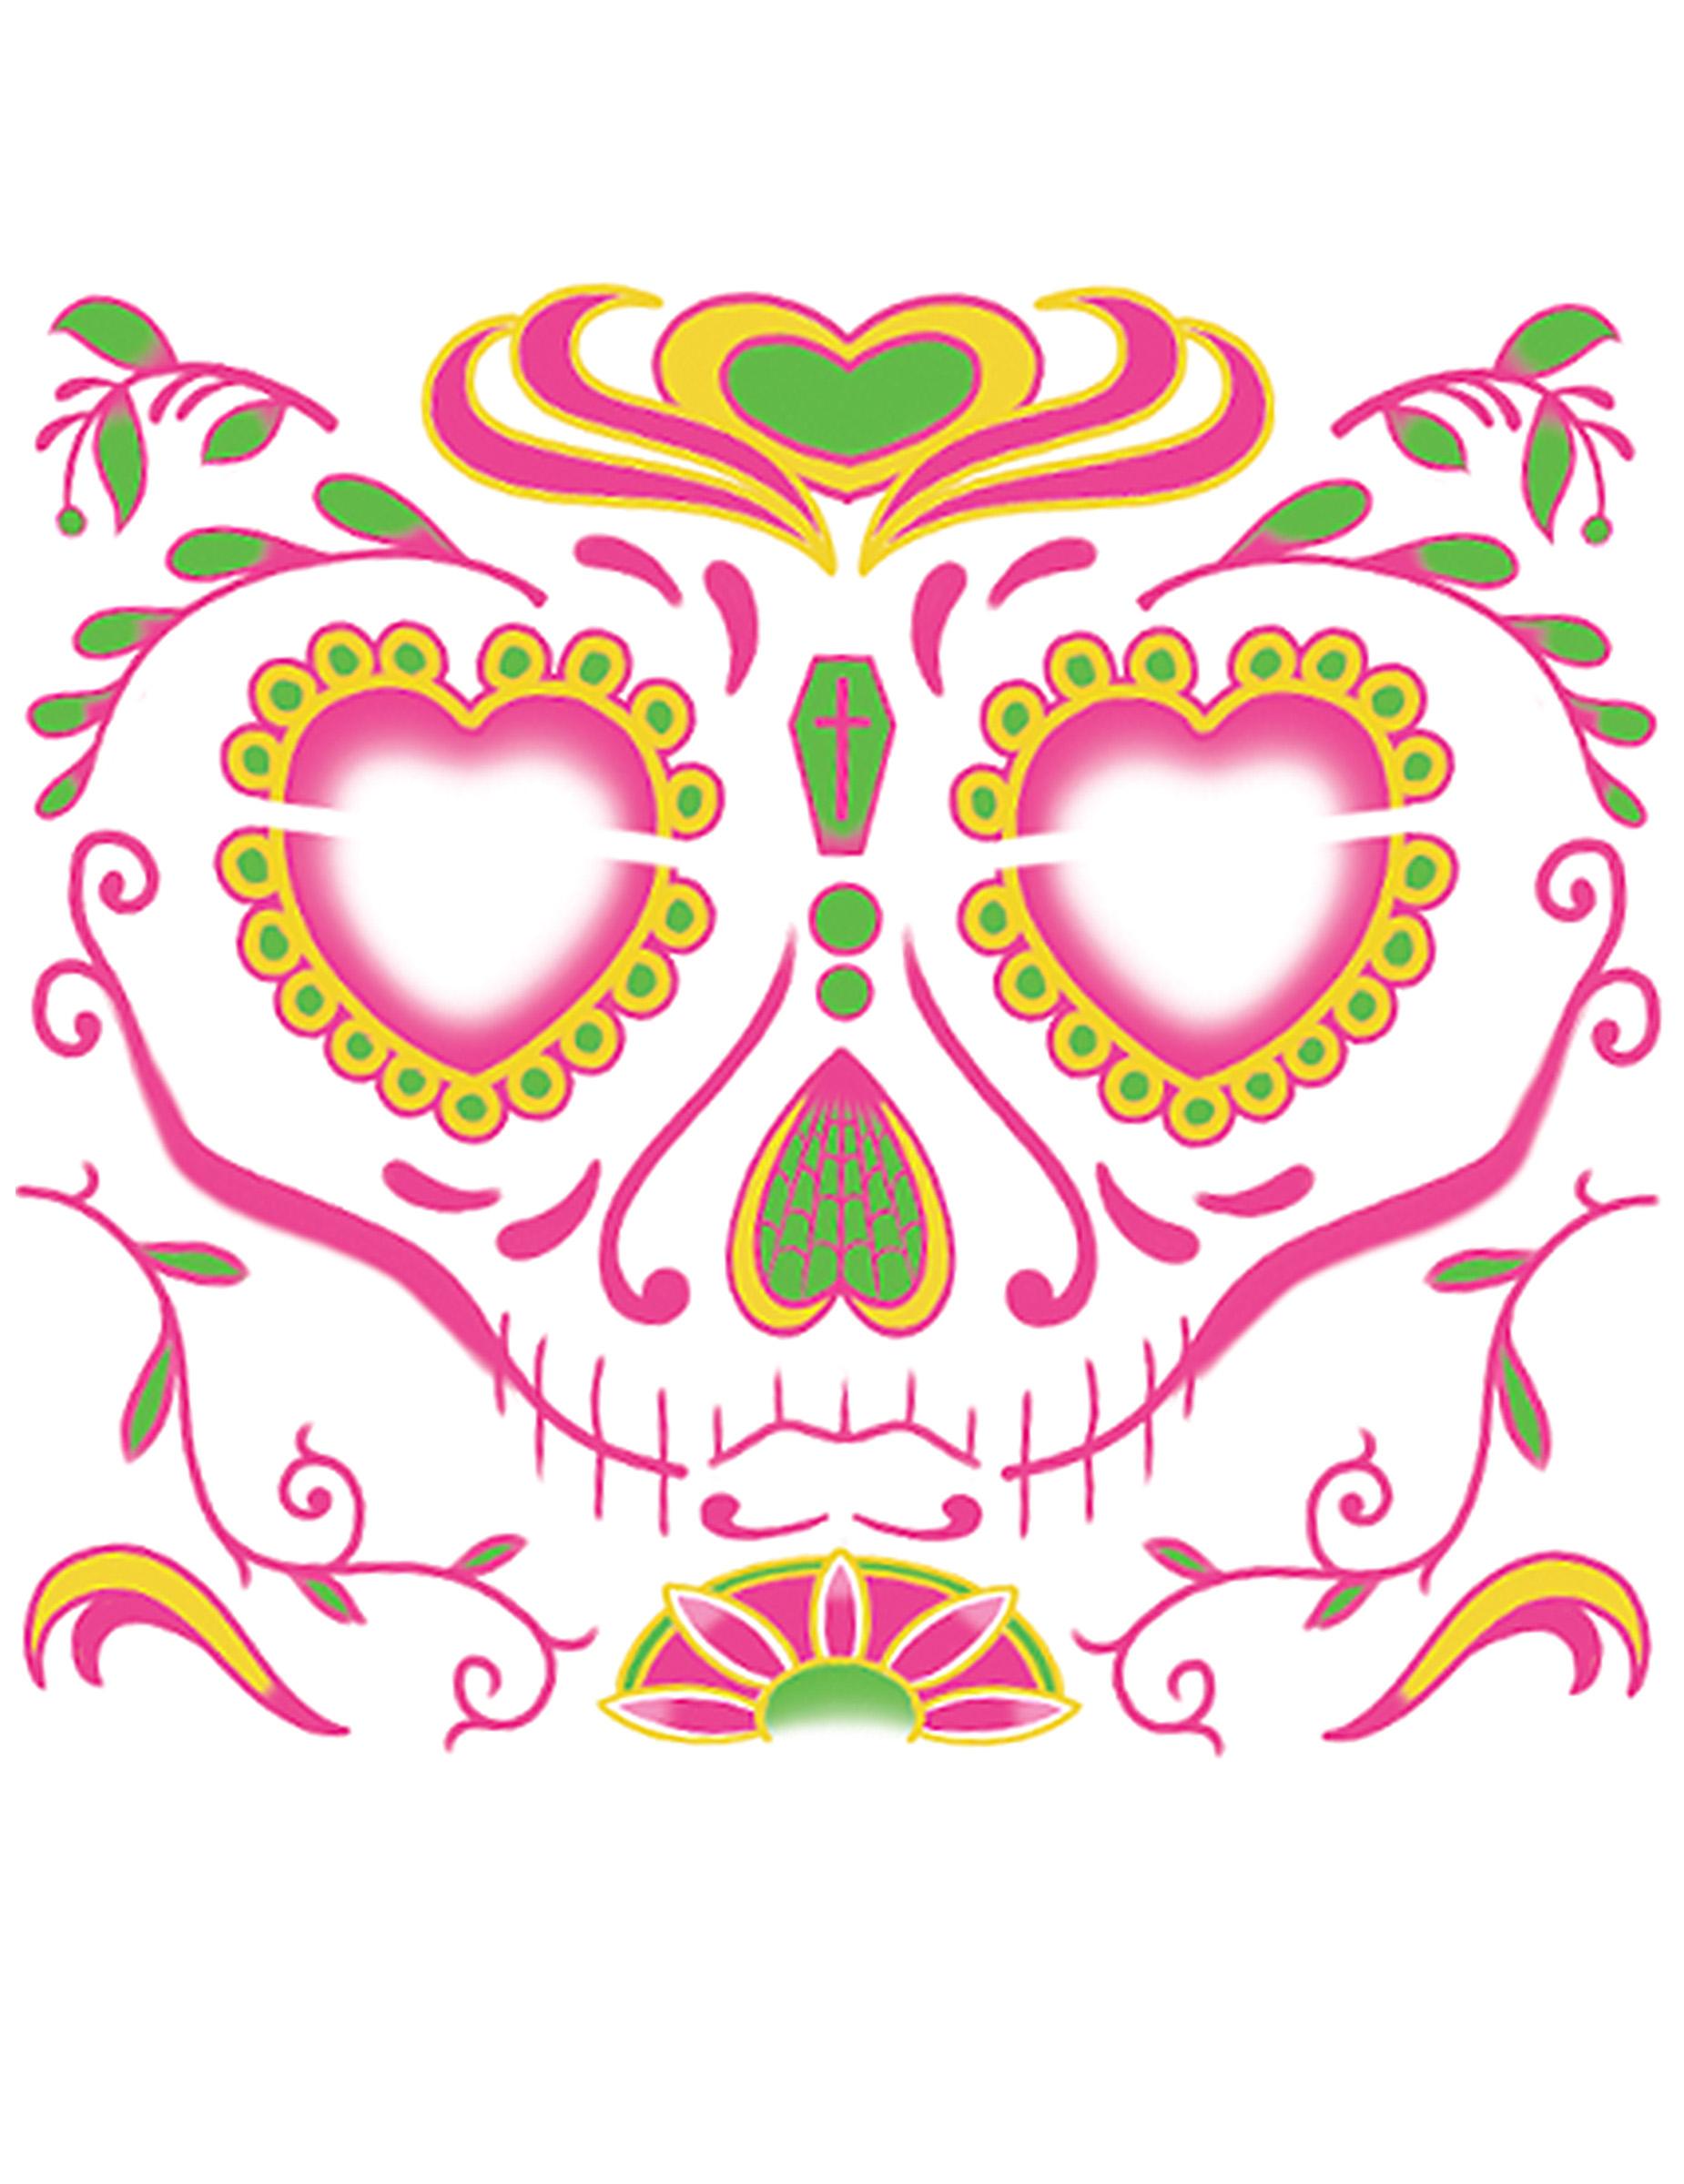 Tatouage Ephemere Visage Dia De Los Muertosfemme Deguise Toi